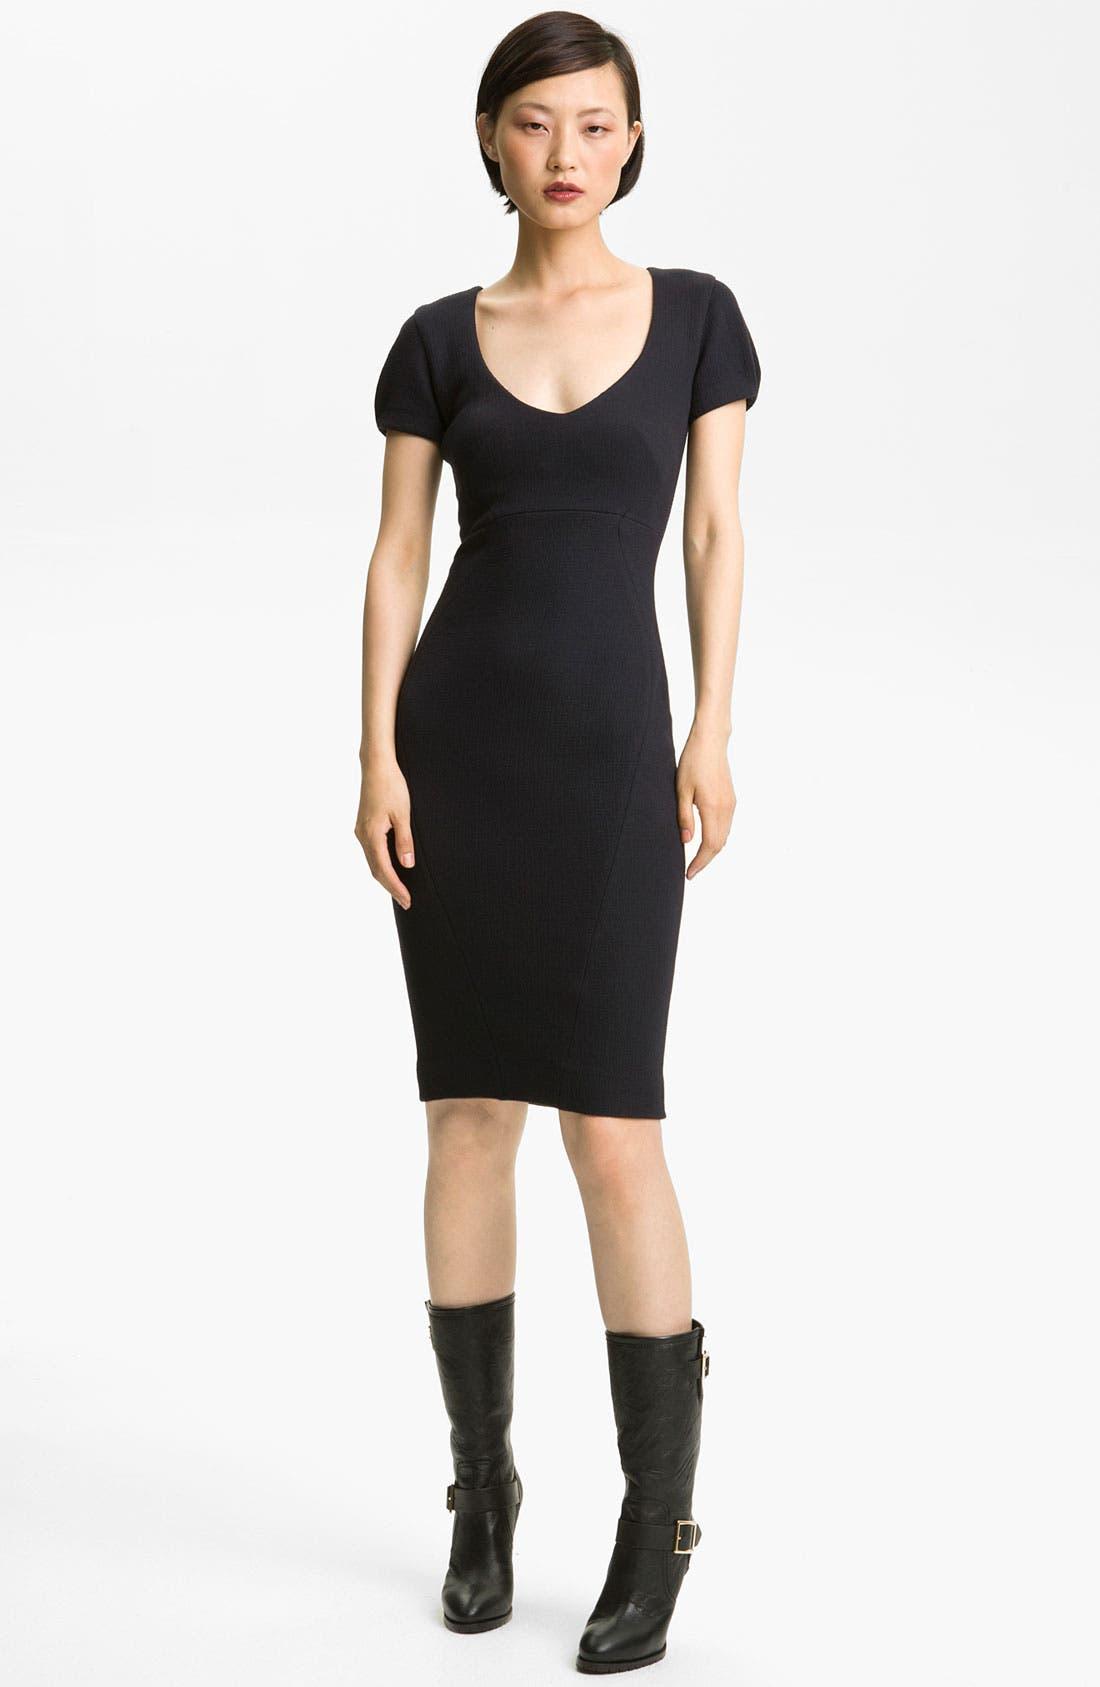 Alternate Image 1 Selected - L'AGENCE Ponte Knit Dress